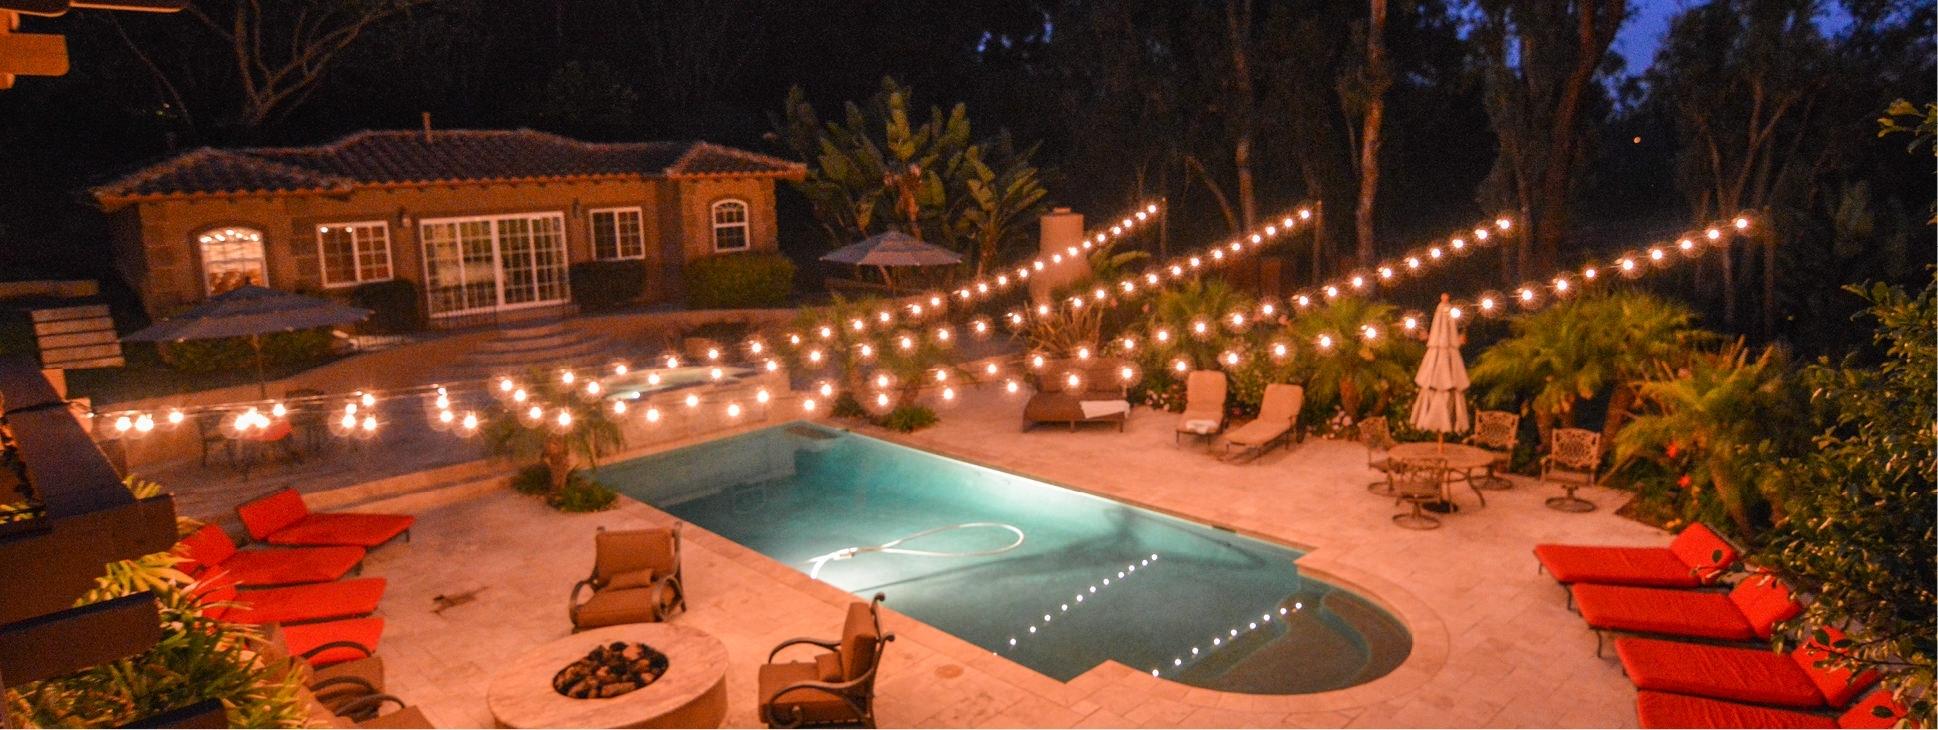 Elegant Patio String Lighting Backyard String Lighting Ardoros M26 for Outdoor String Lanterns (Image 9 of 20)